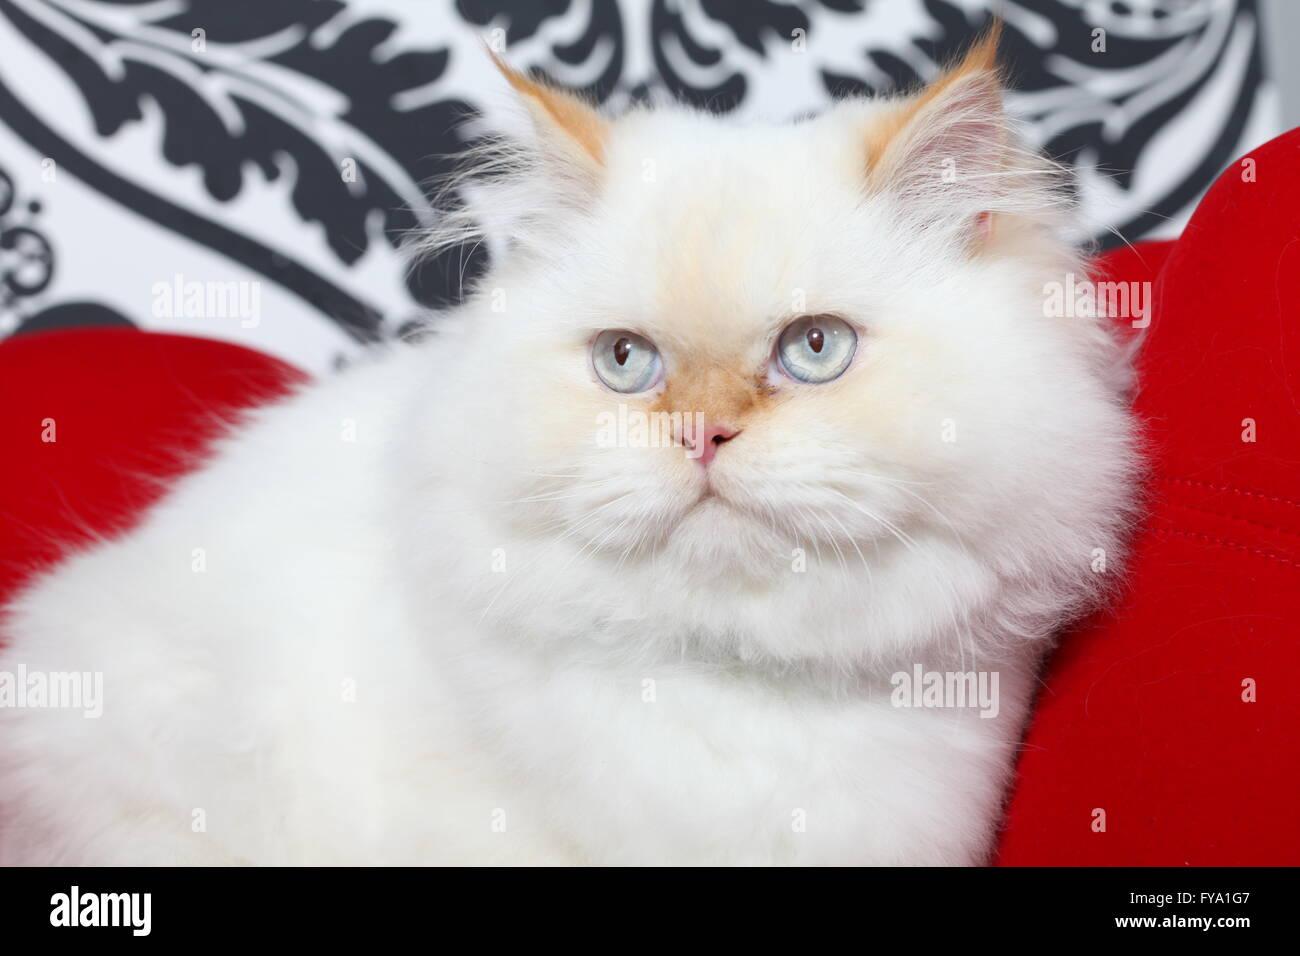 Persian aristocratic cat - Stock Image